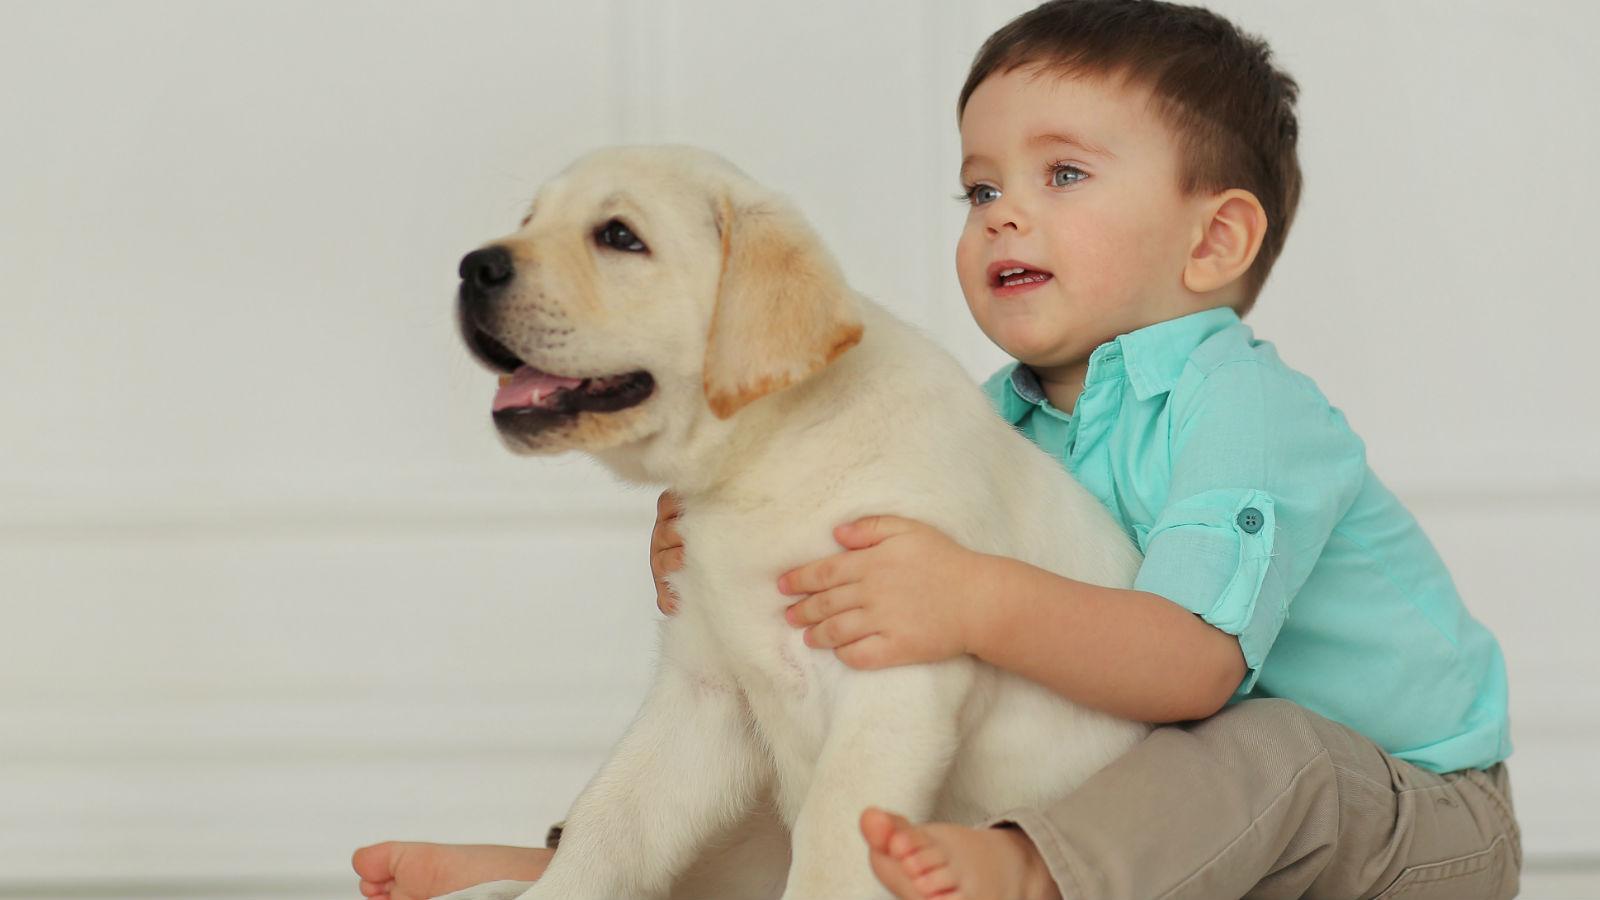 niño pequeño abrazando perro